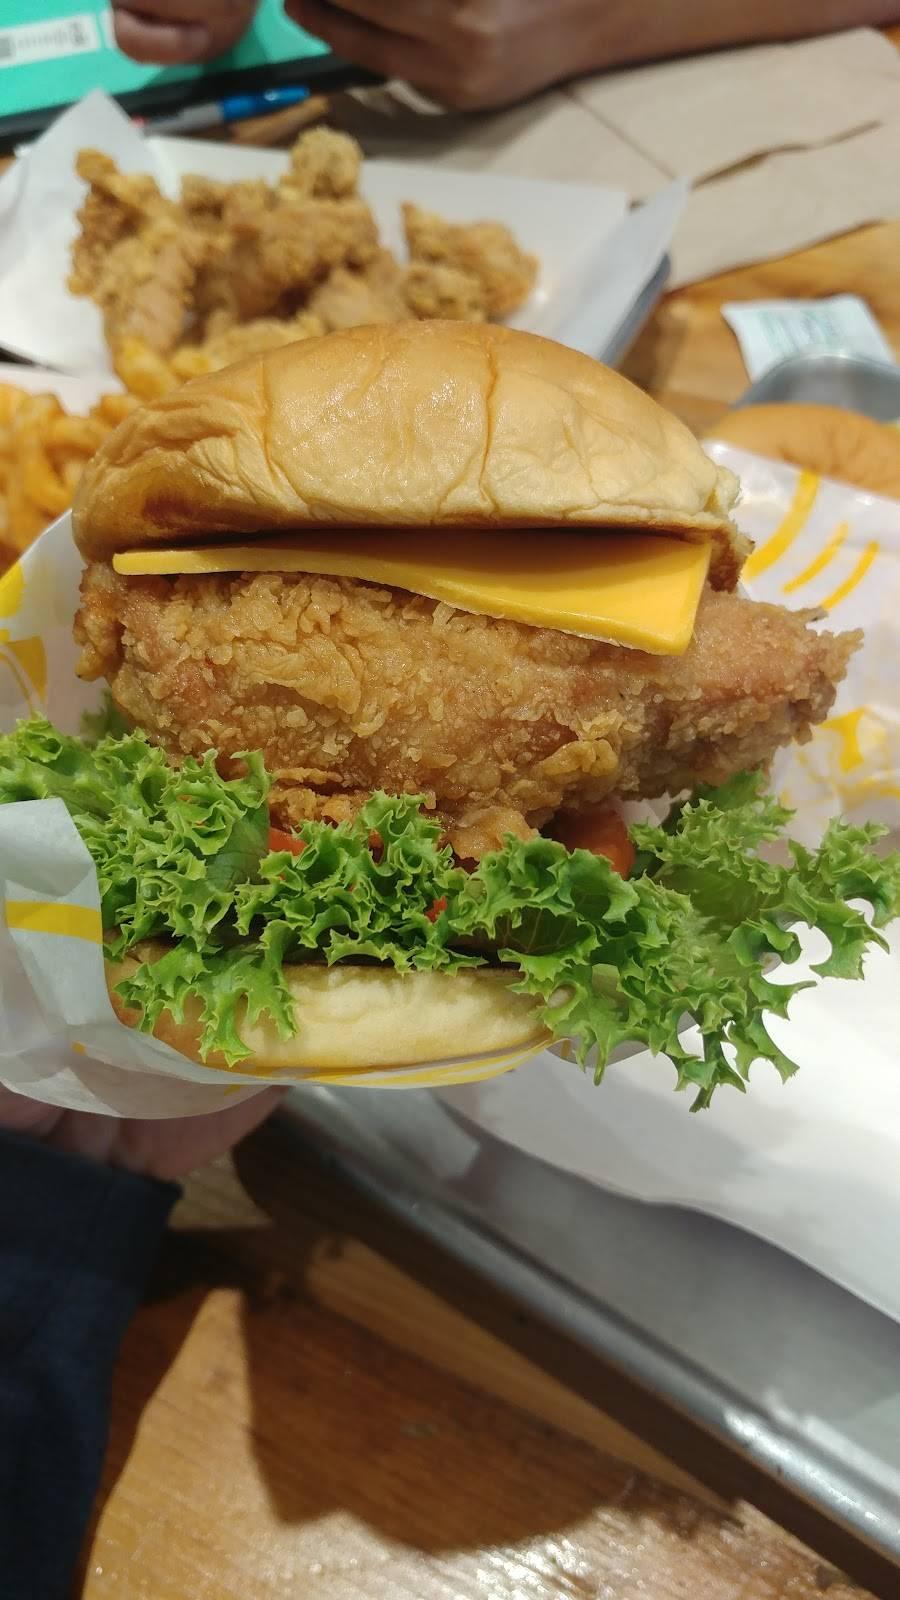 Kung Fu Tea X TKK Fried Chicken   cafe   493 Amherst St, Nashua, NH 03063, USA   6035218286 OR +1 603-521-8286